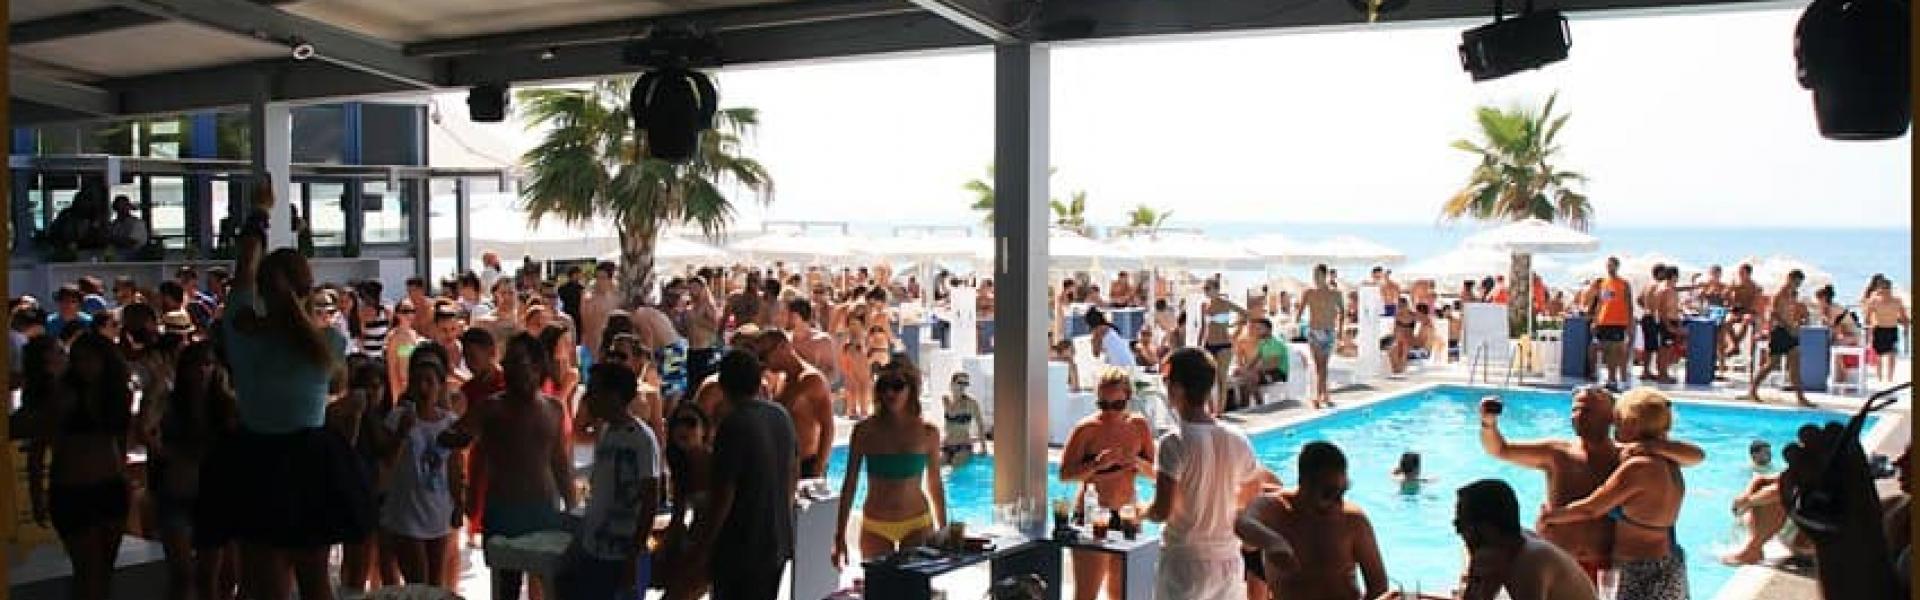 Level 2 beach bar